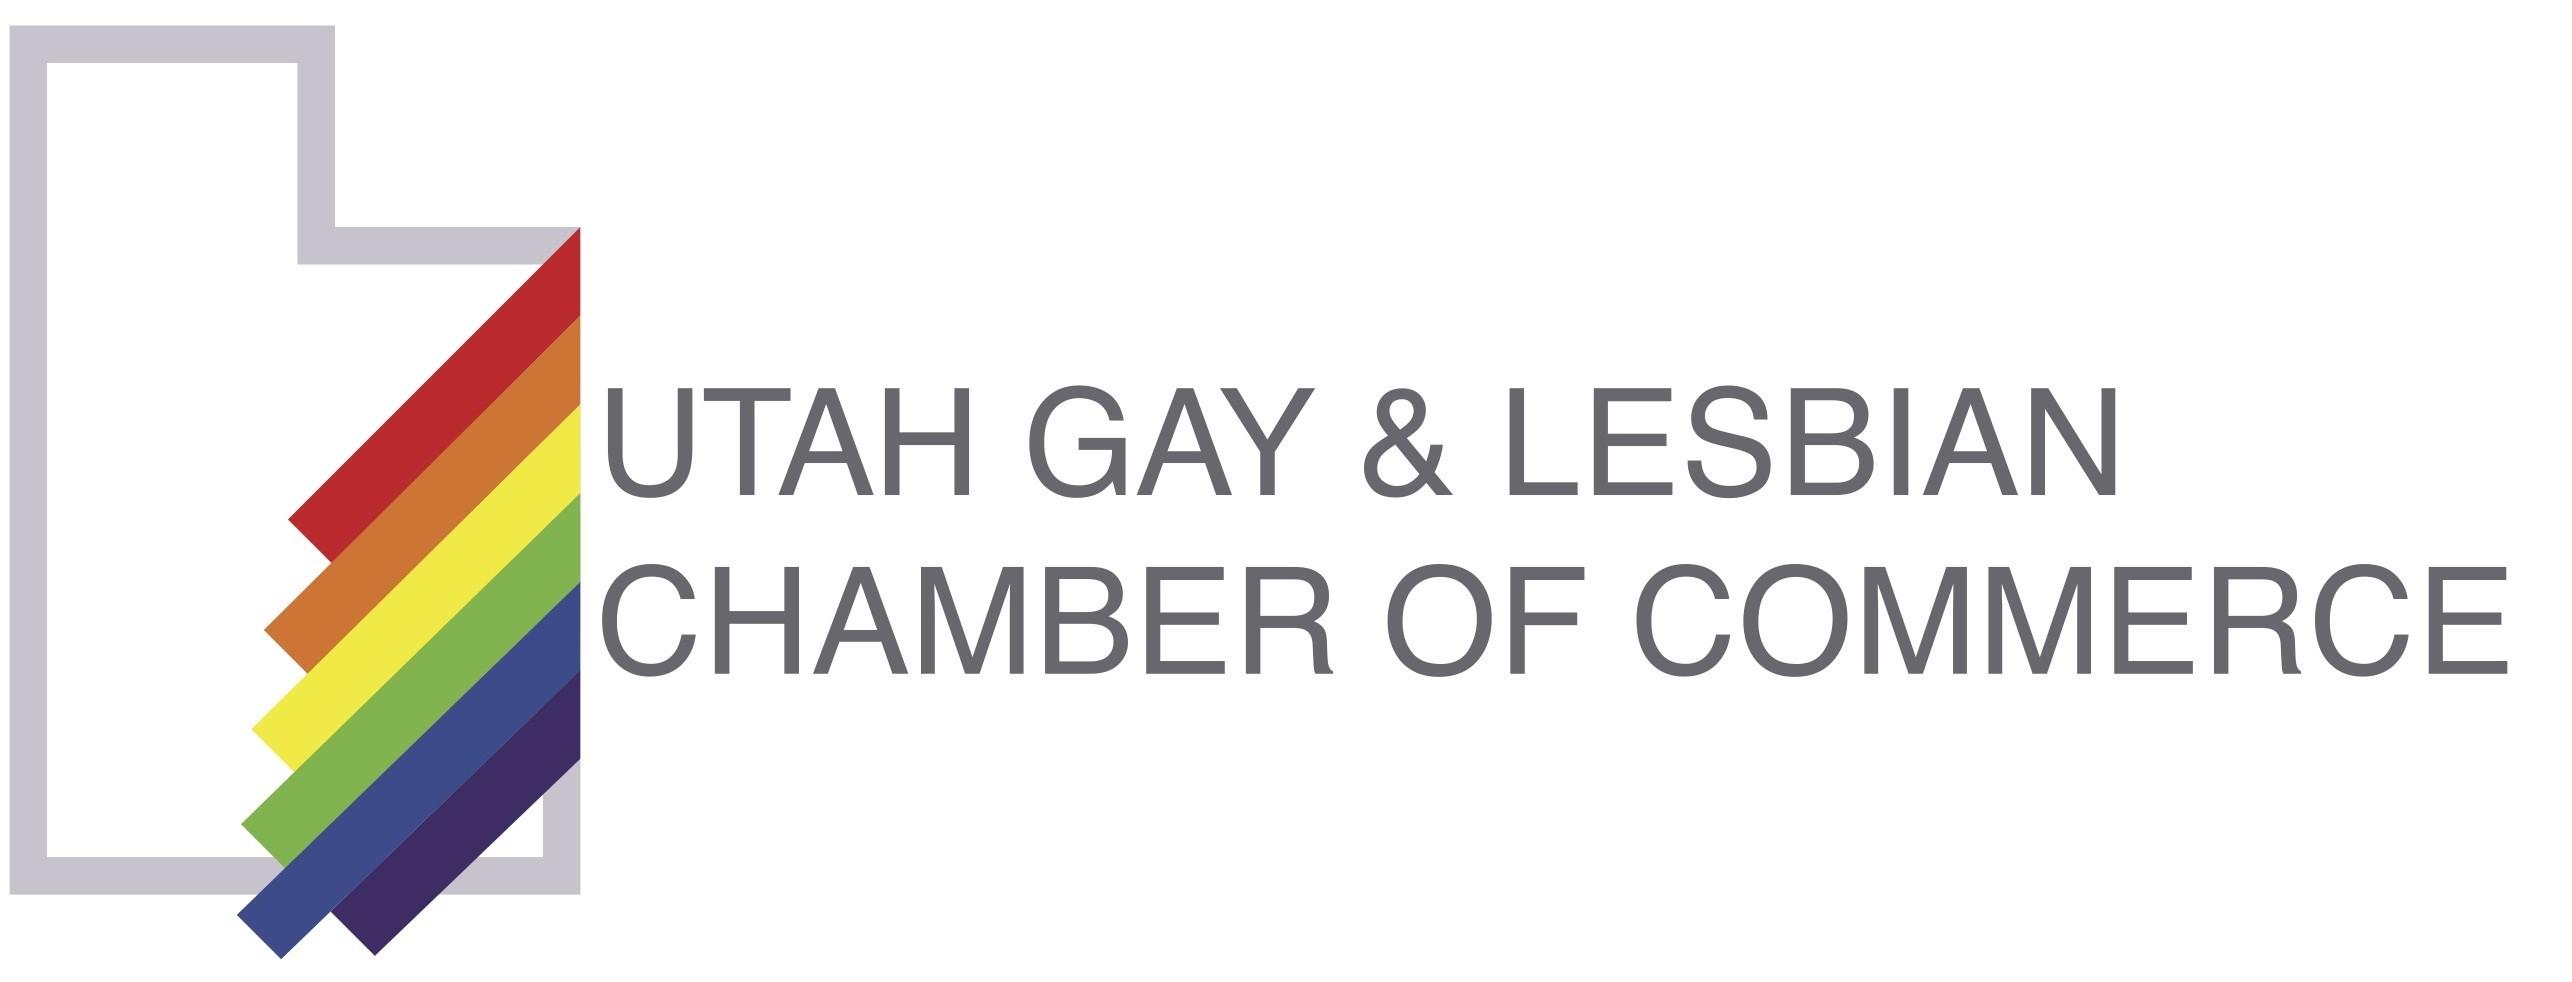 Utah Gay & Lesbian Chamber